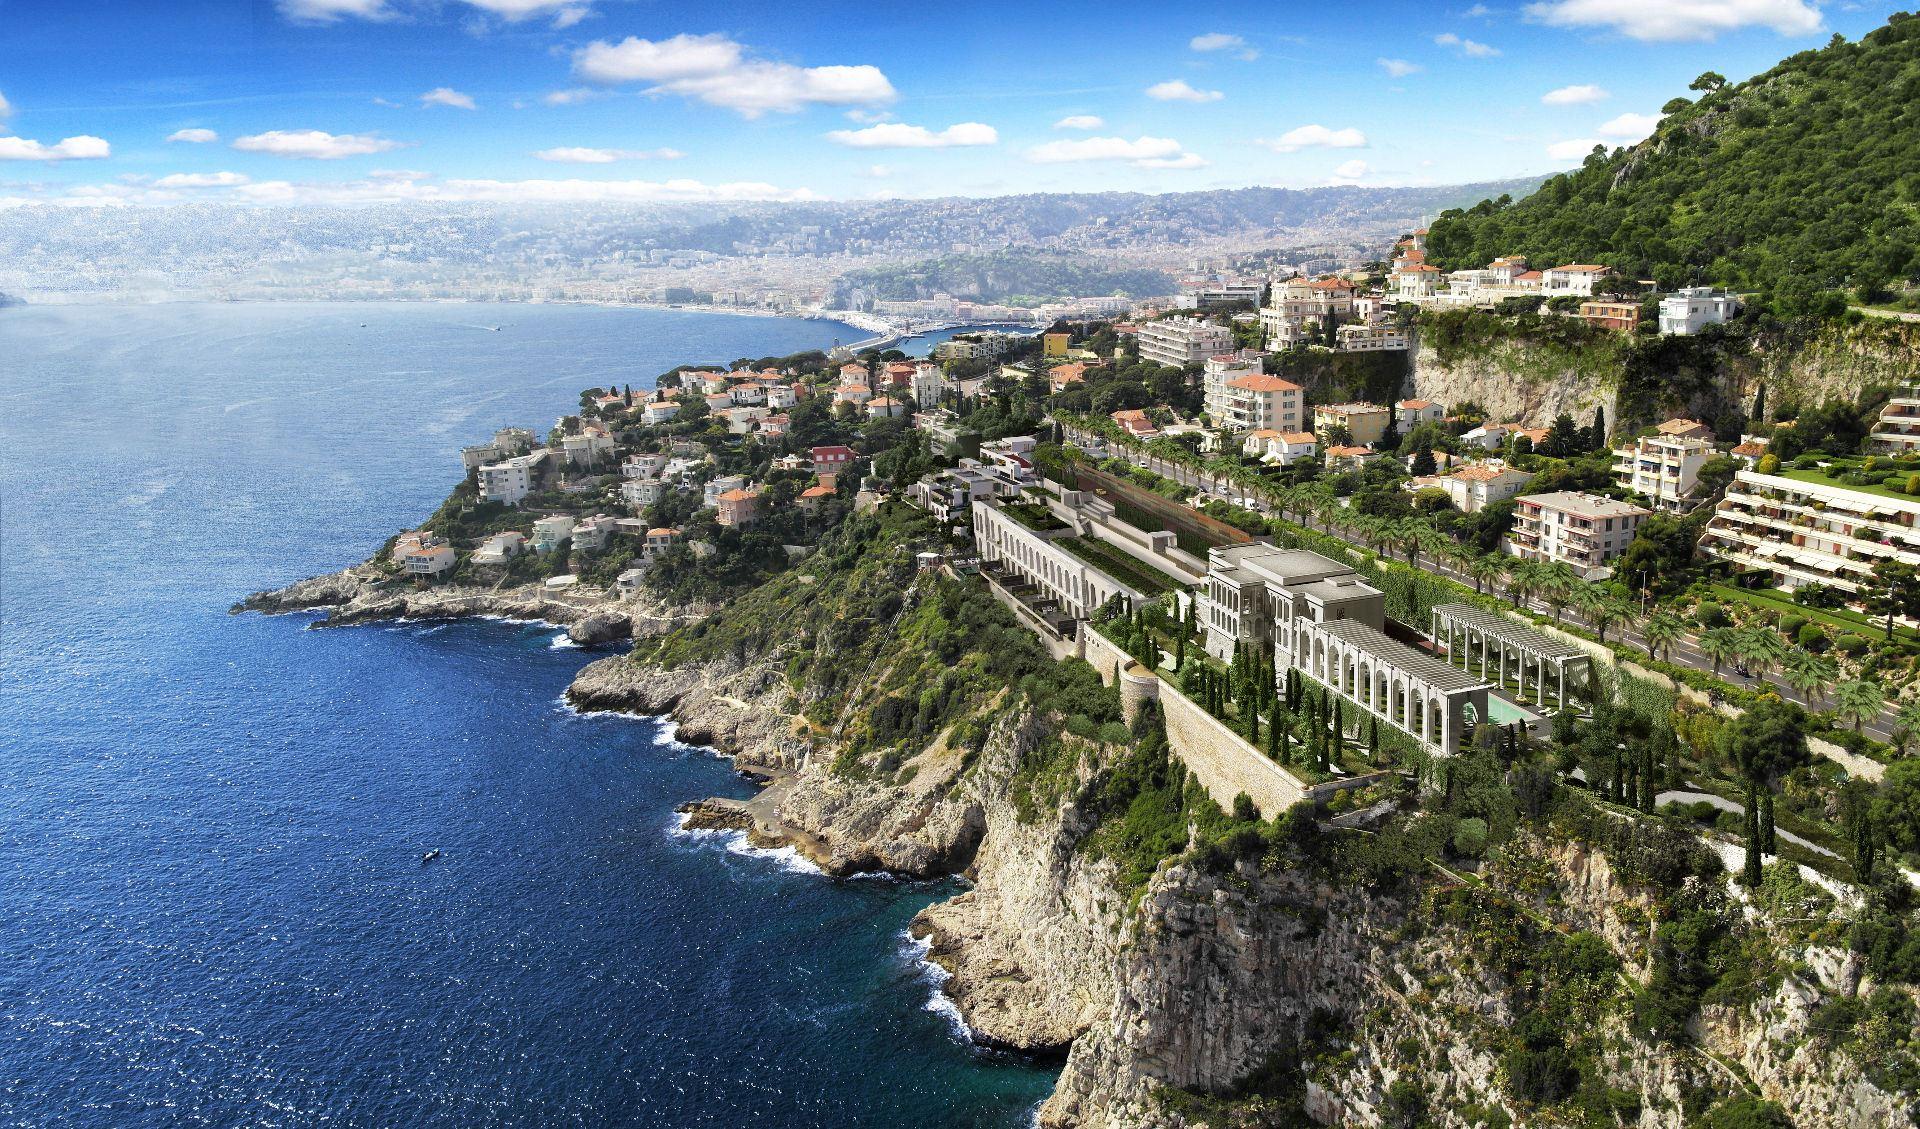 Property For Sale at Palais Maeterlinck -- Melissande ouest - The legendary elegance of Nice